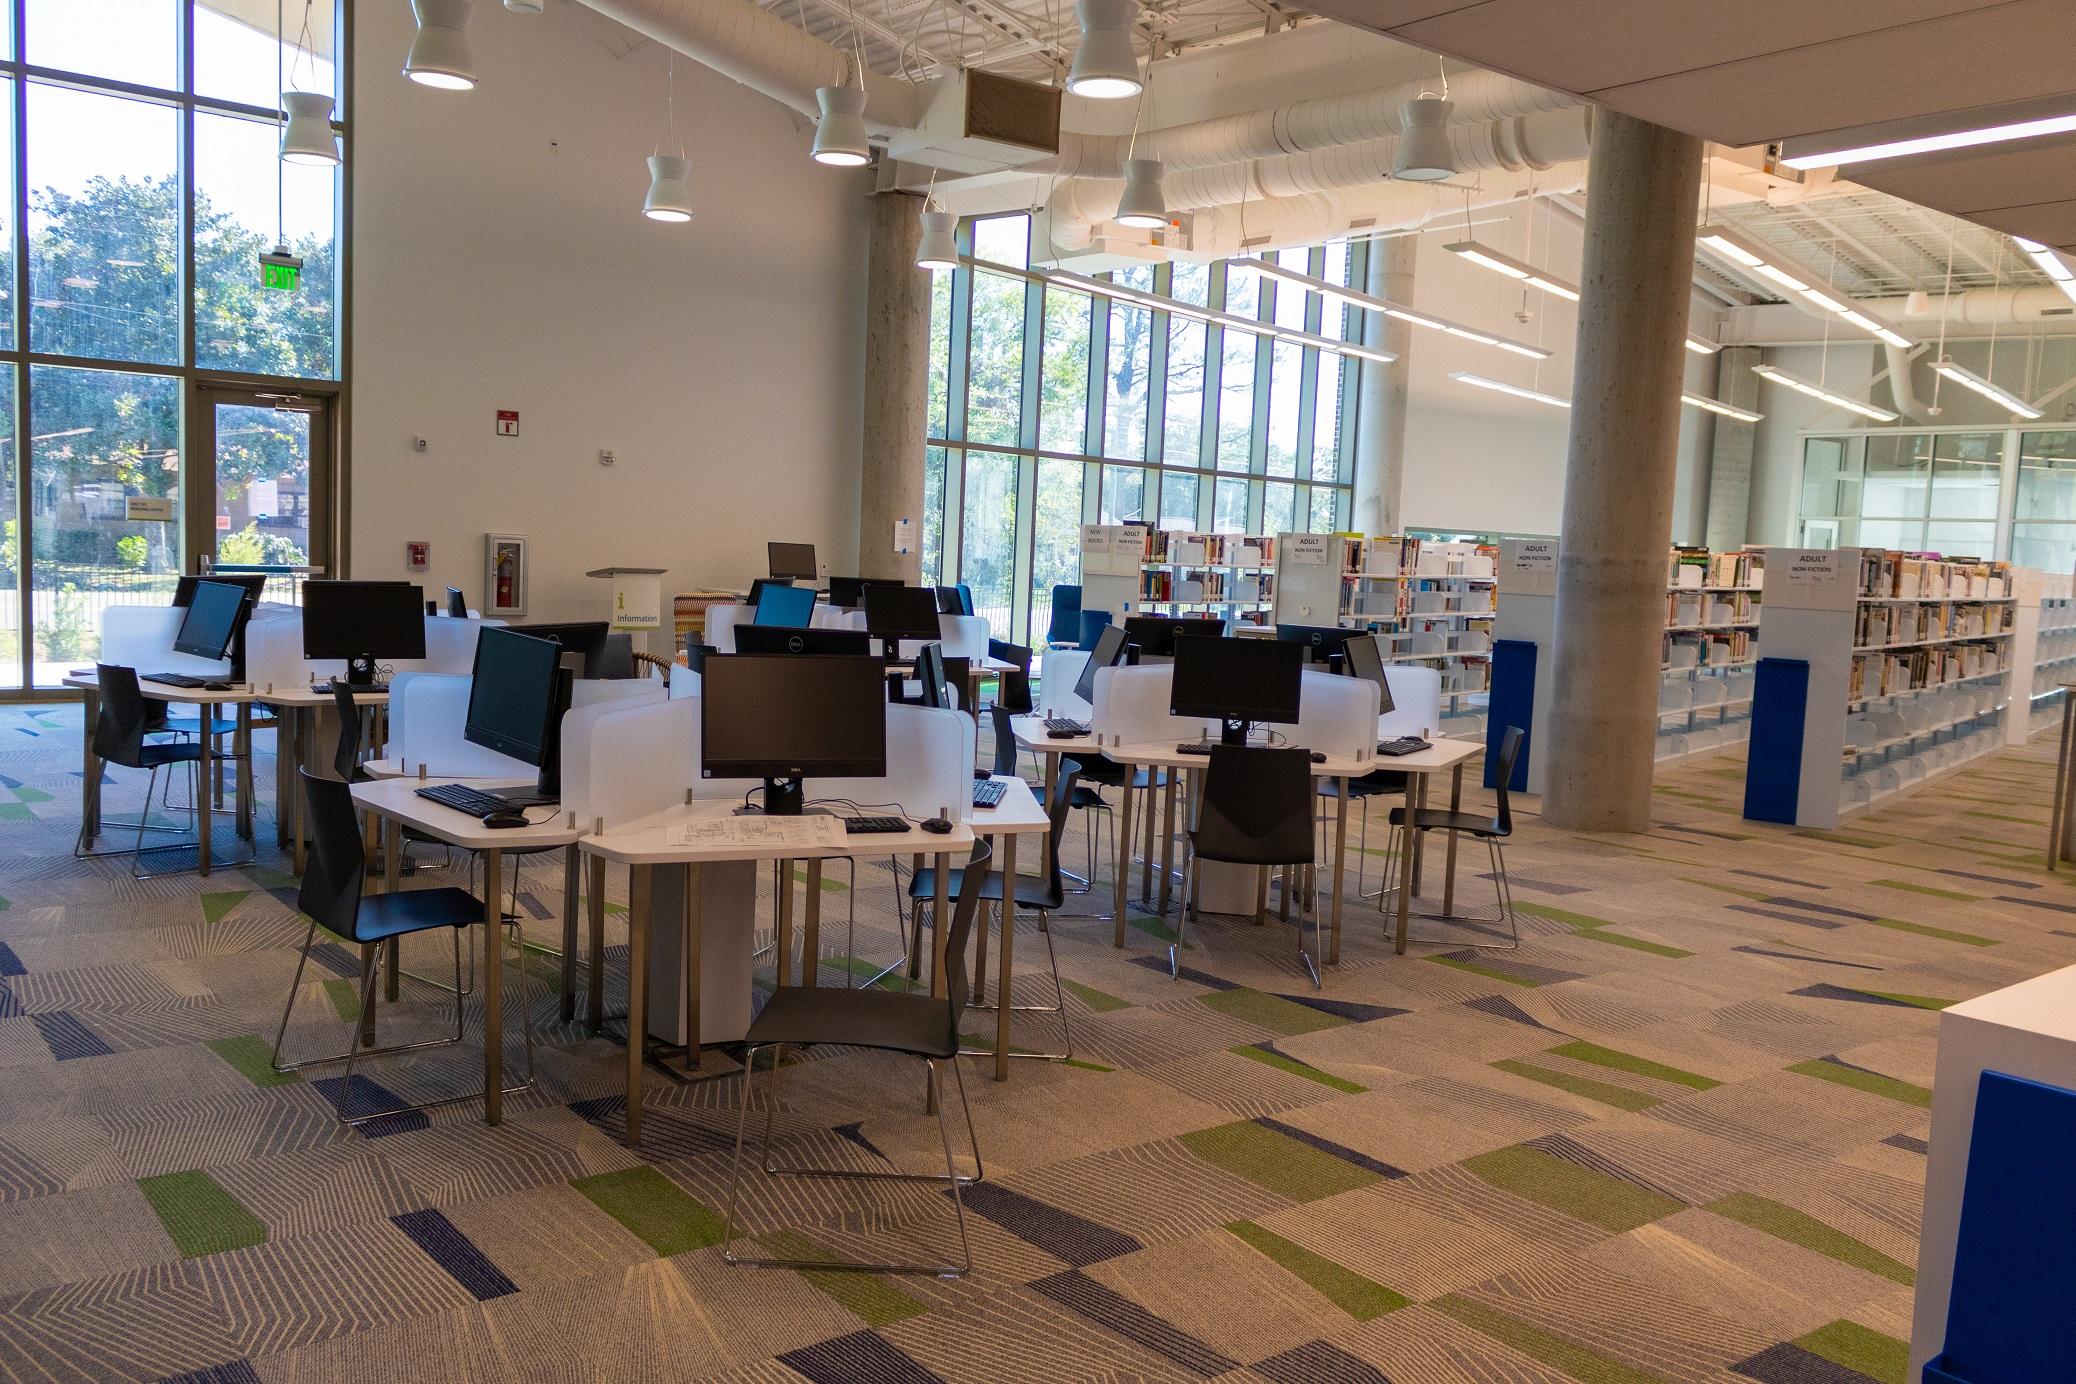 Baxter-Patrick James Island Library - public computers